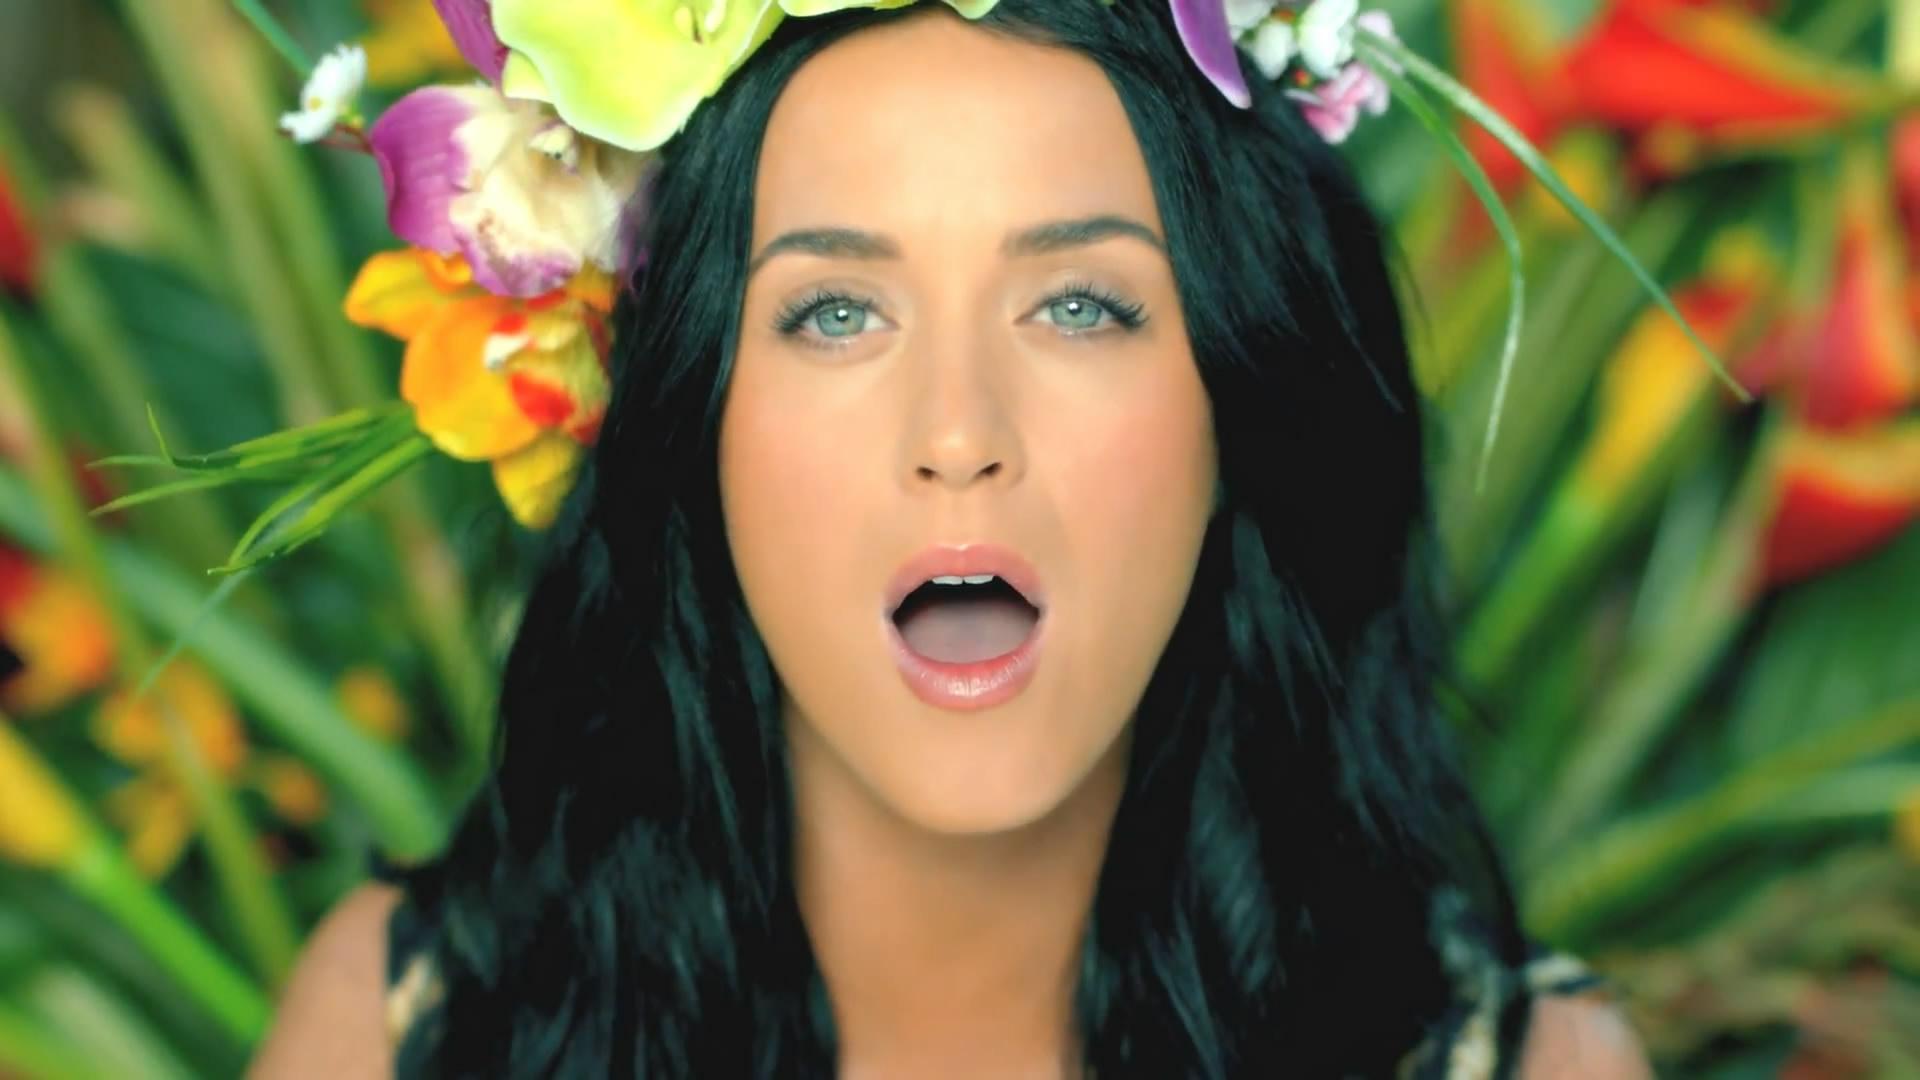 Katy perry roar youtube katy perry roar music video hd 16g voltagebd Images